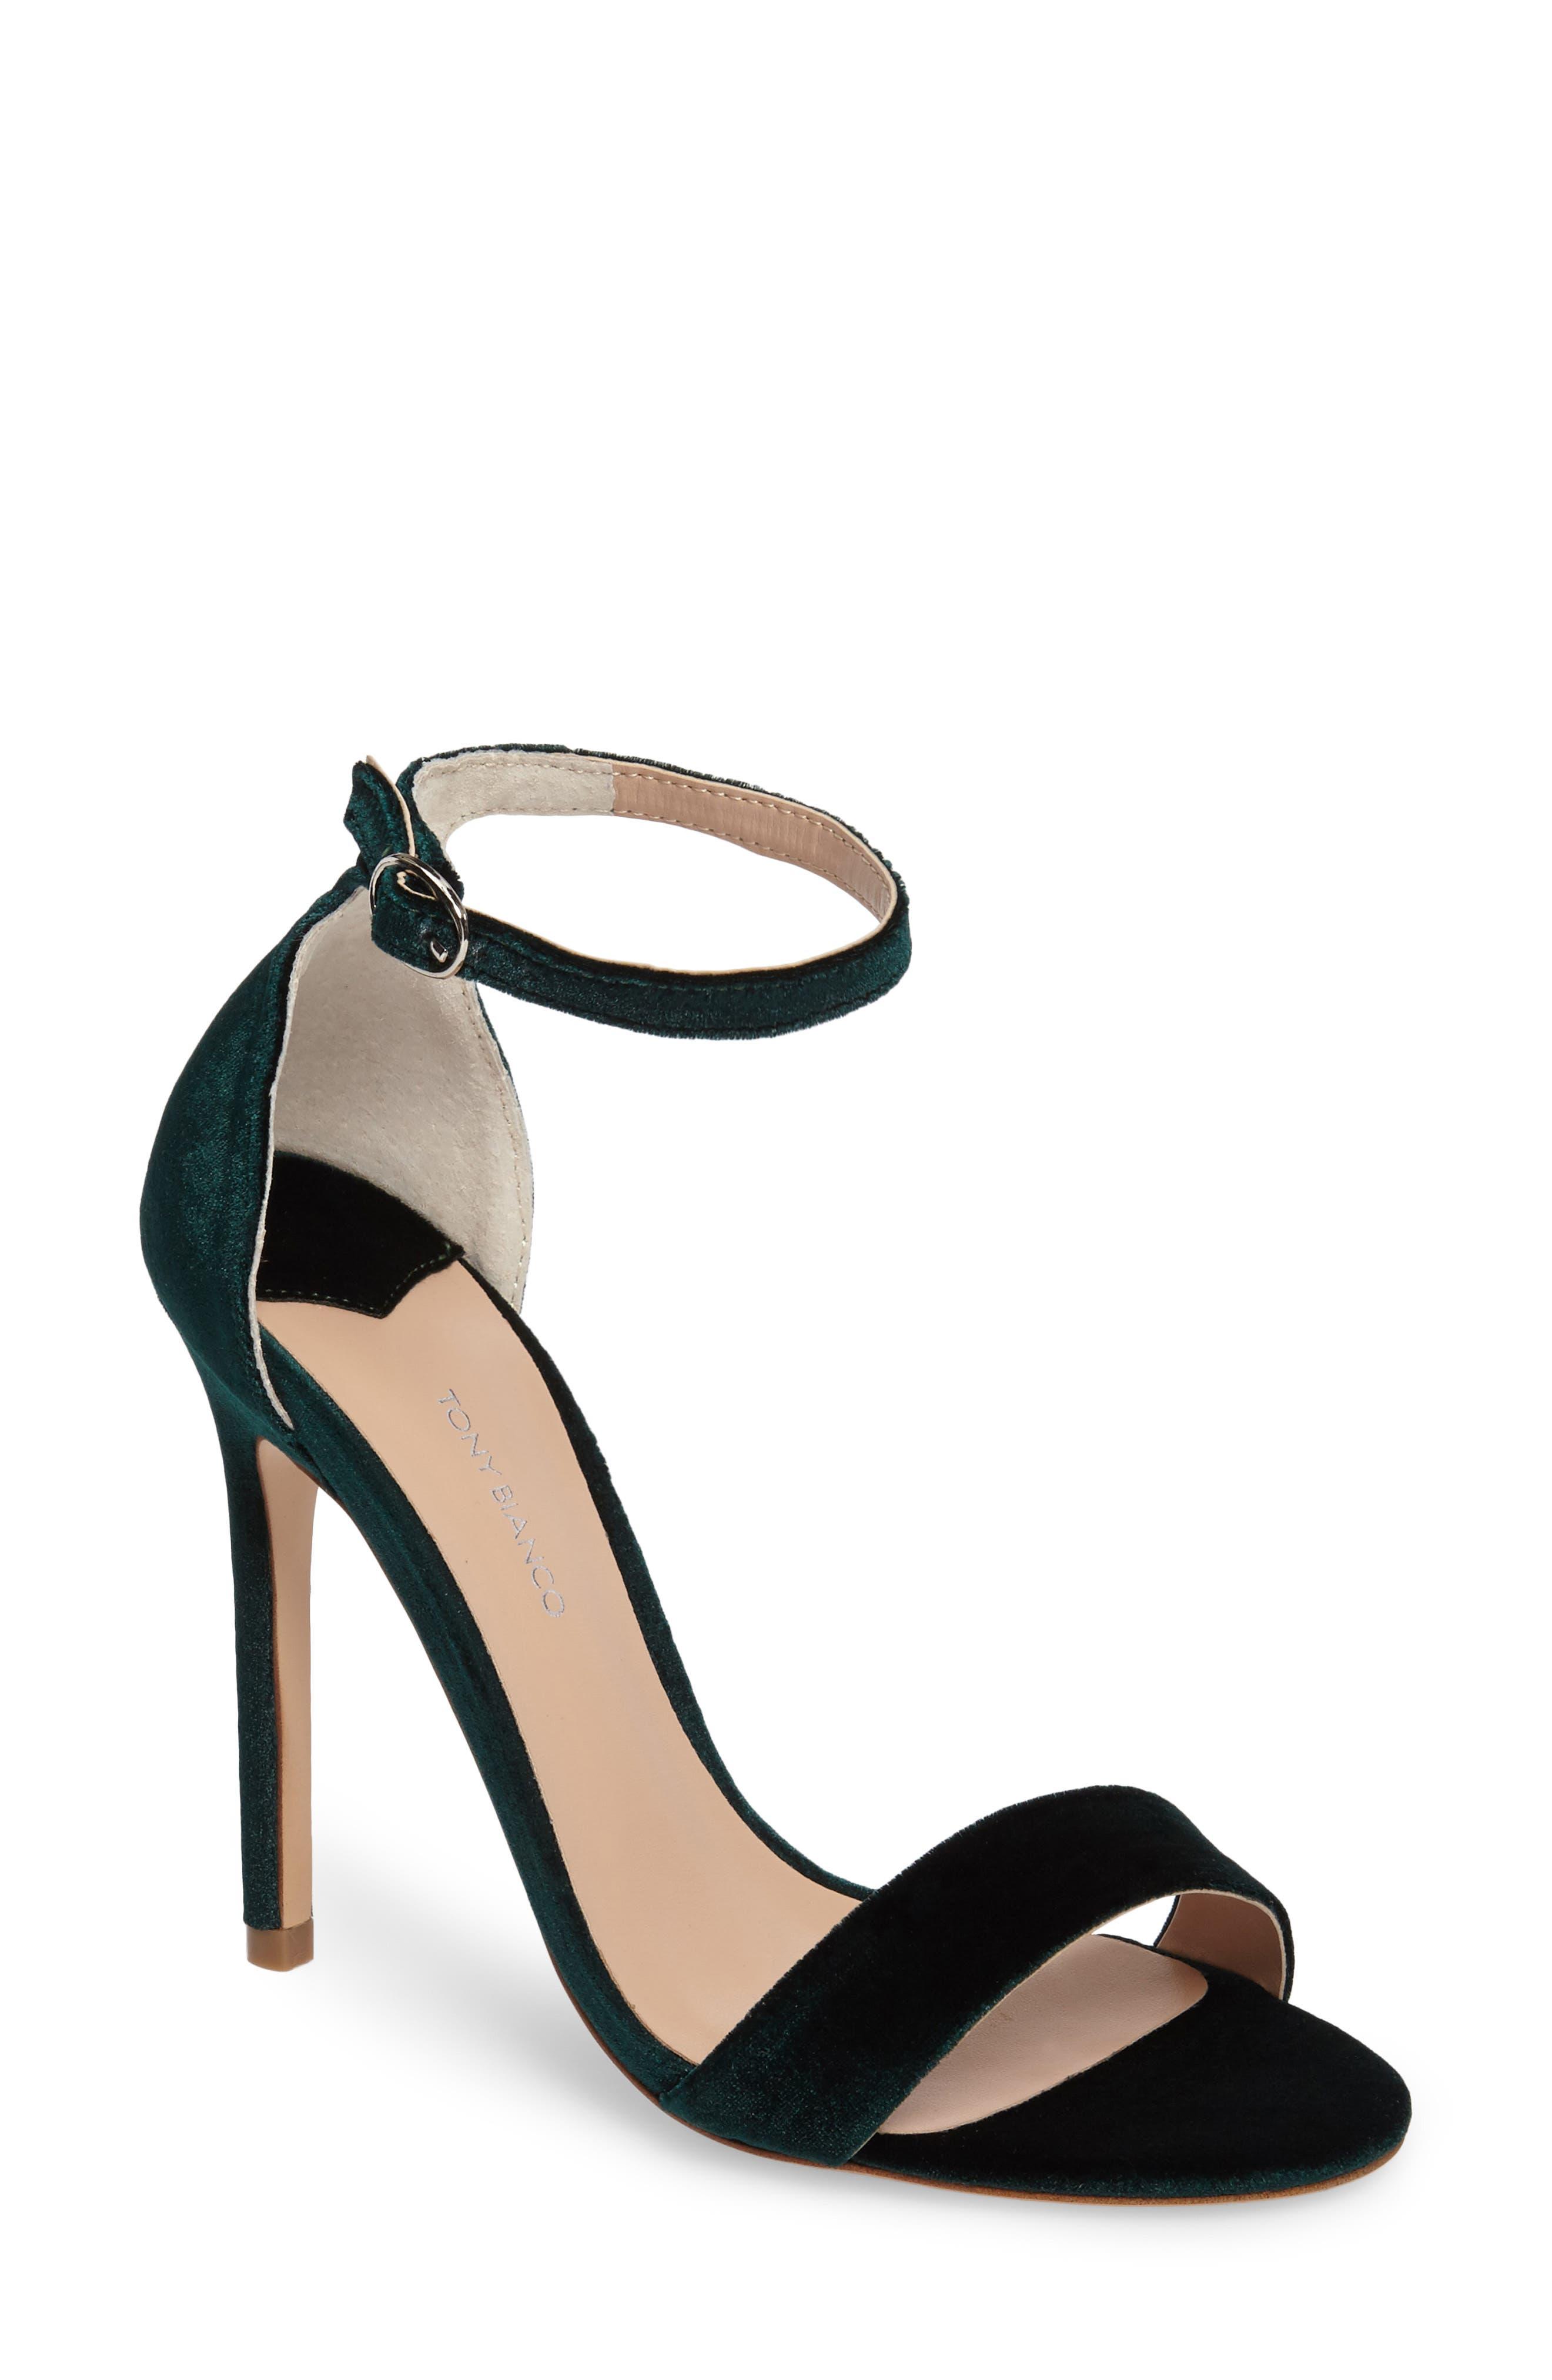 Main Image - Tony Bianco Karvan Ankle Strap Sandal (Women)